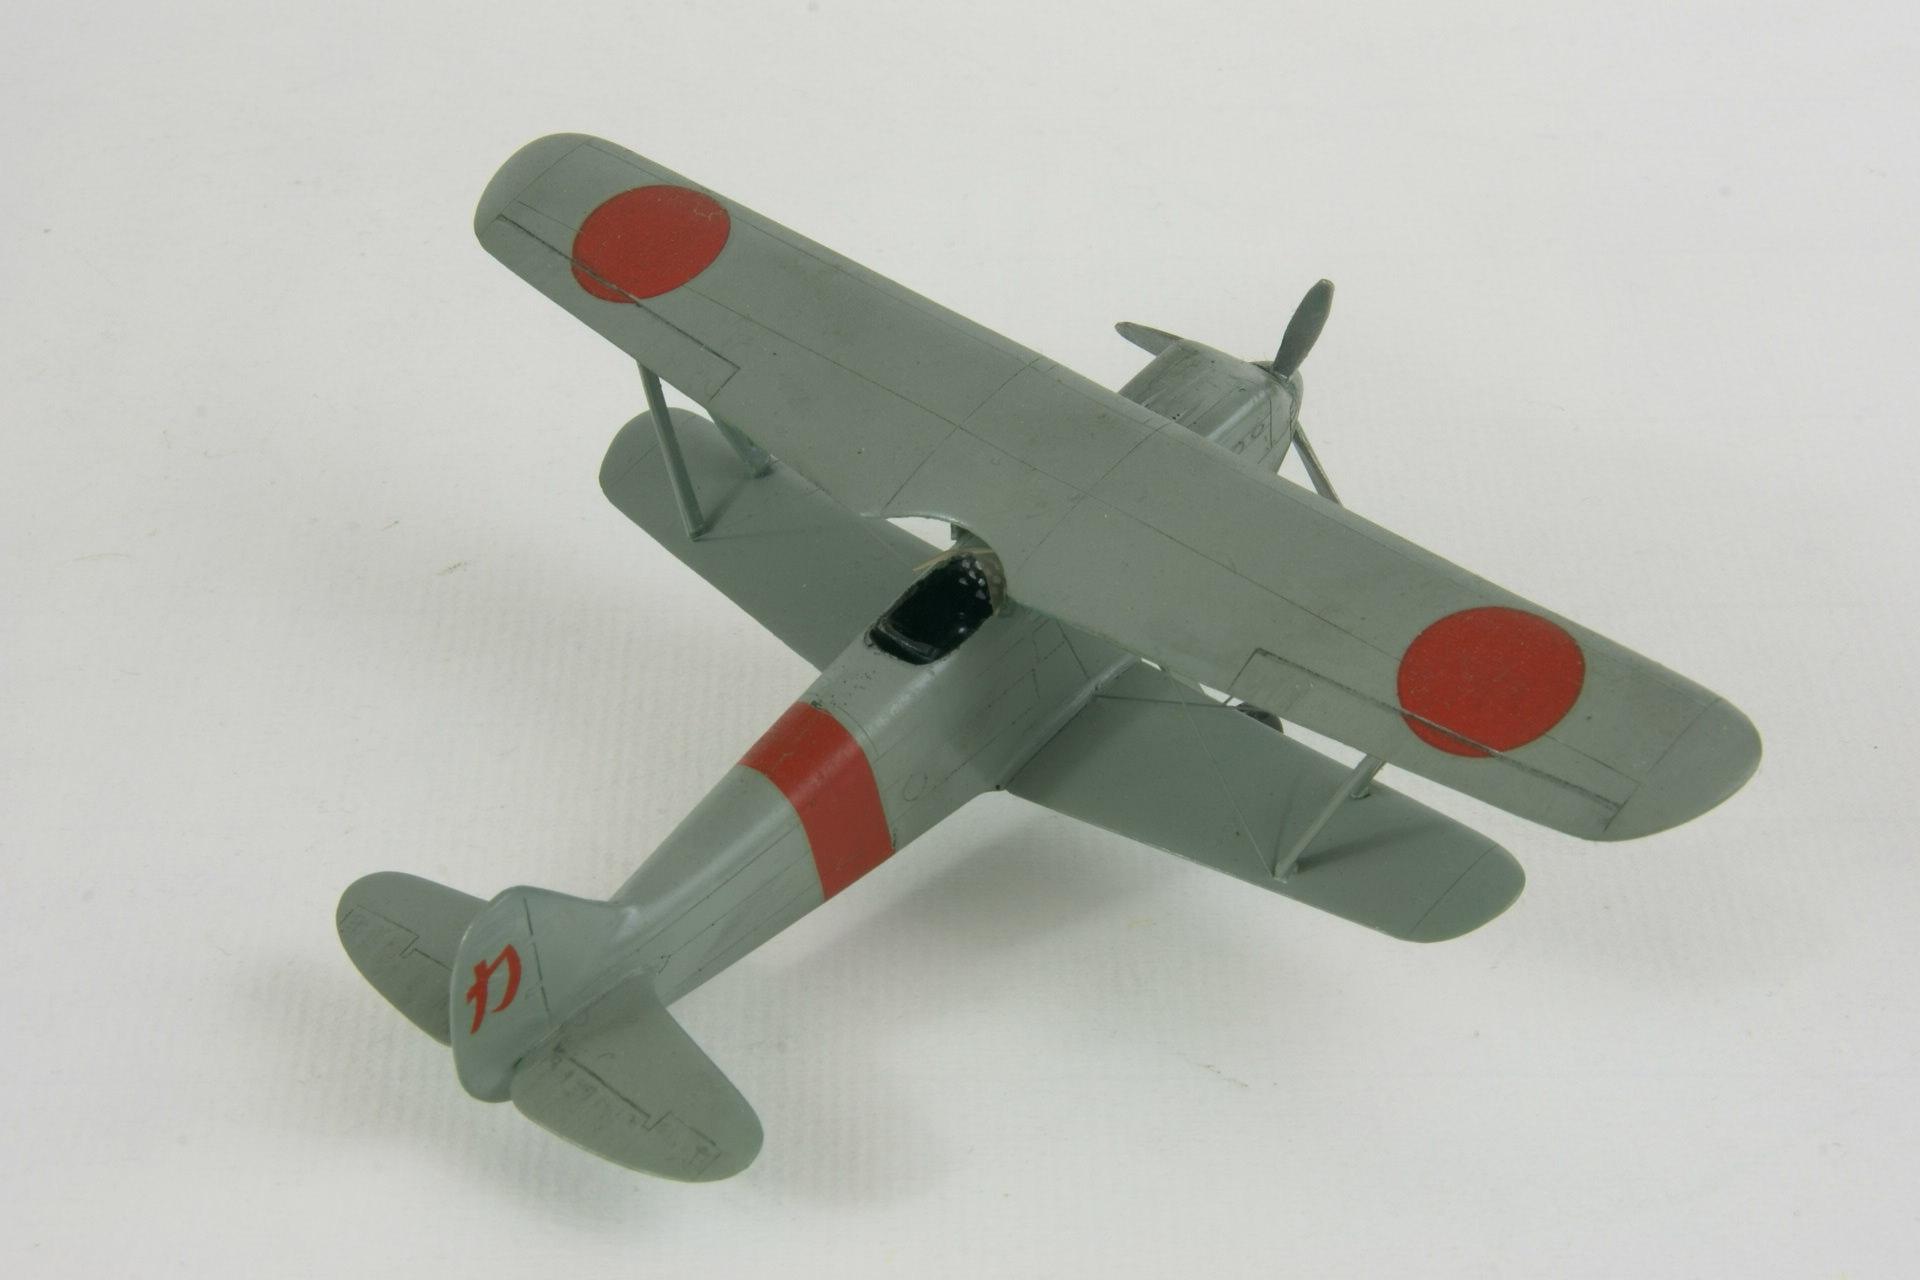 Kawasaki ki 10 perry 3 1